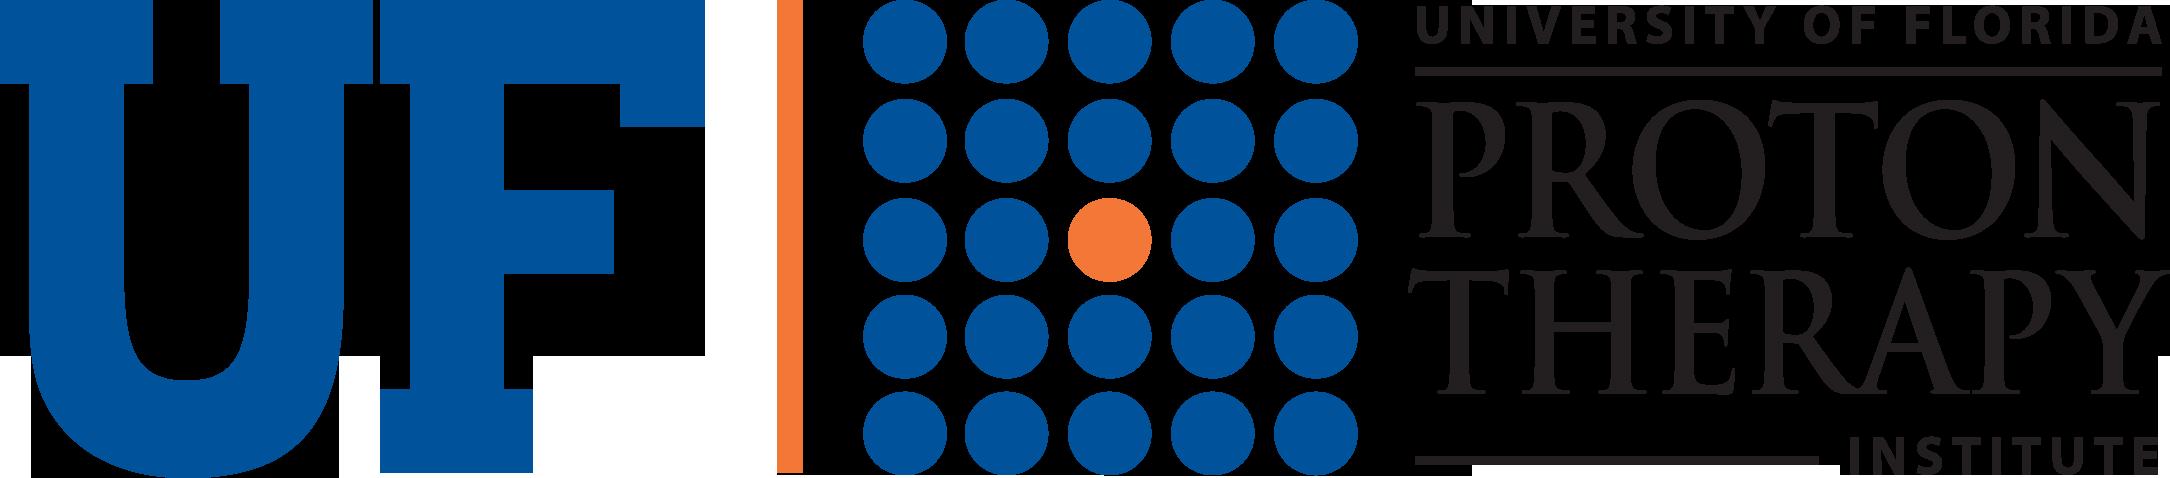 UF_FProton_Orange-Blue_K_rSg